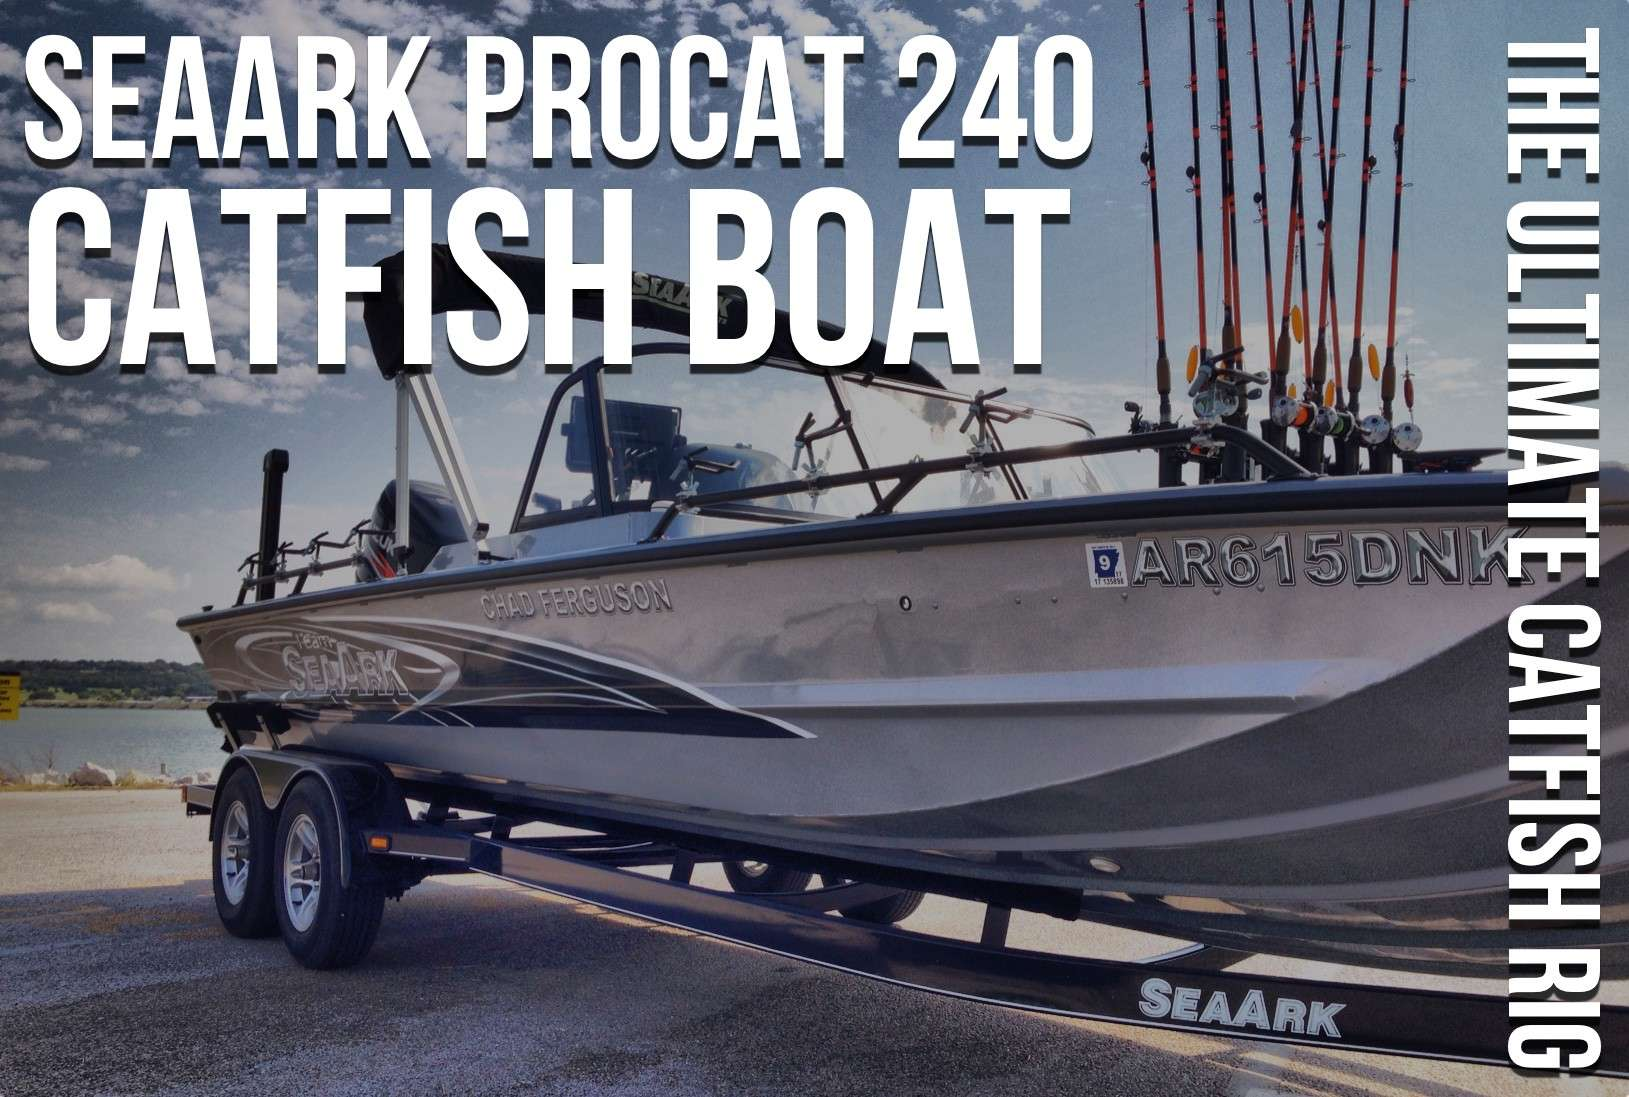 SeaArk ProCat 240 Catfish Boat: The Ultimate Catfish Rig